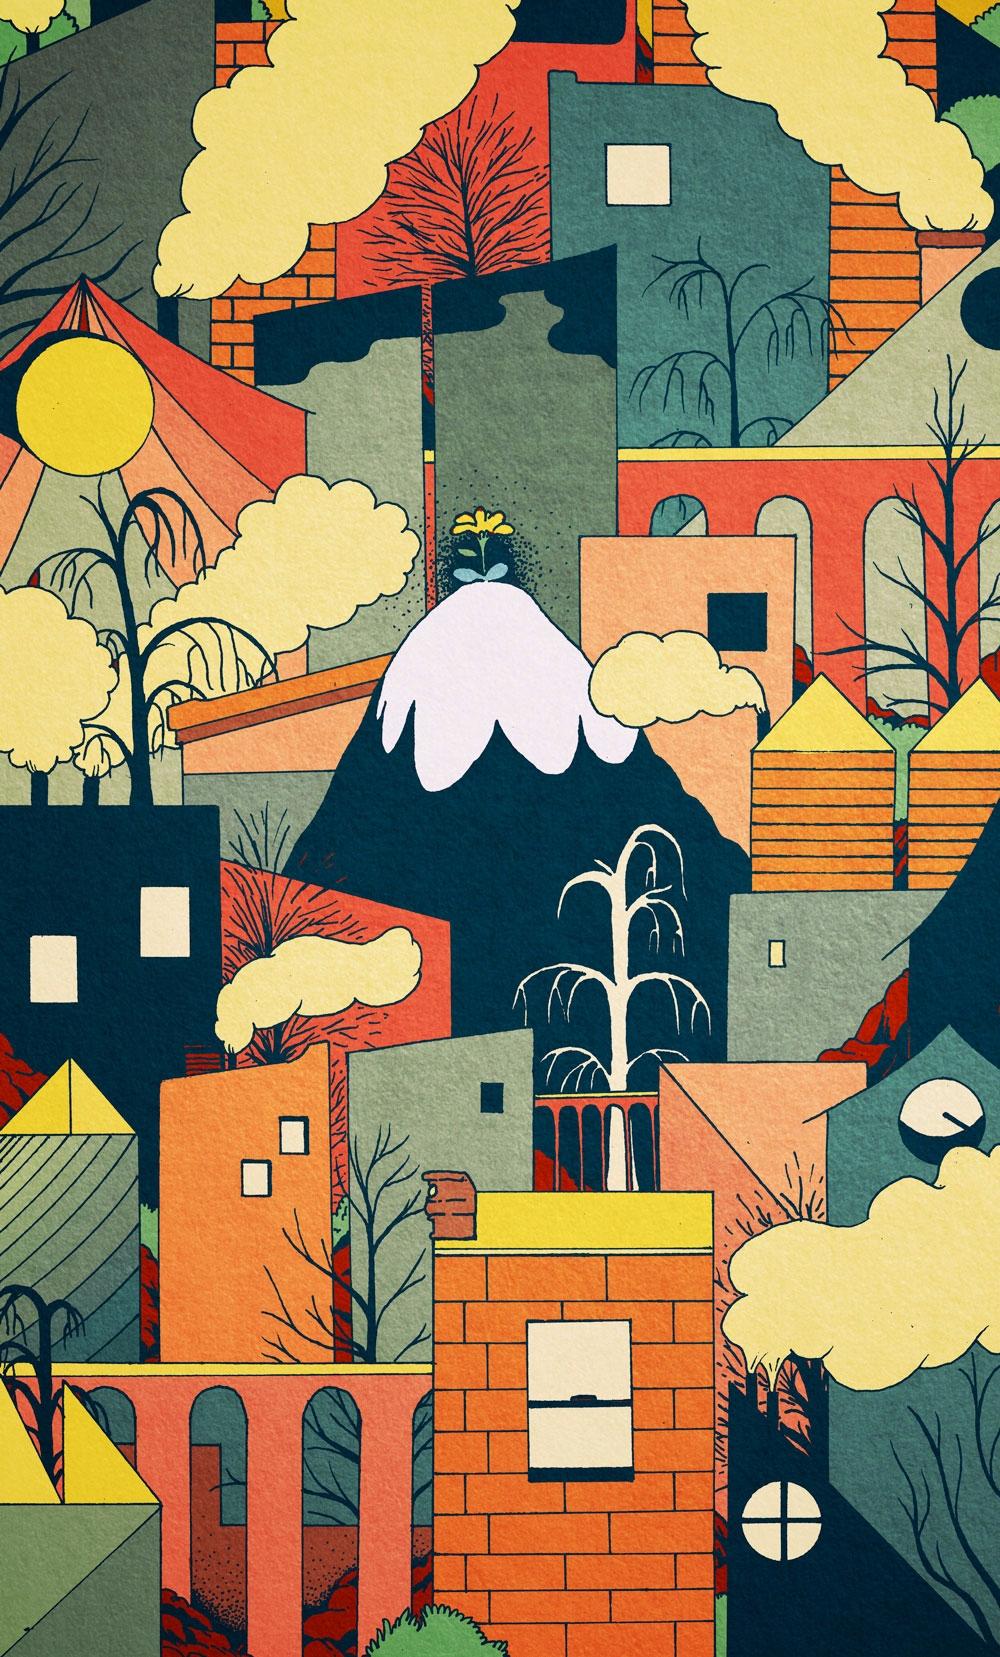 illustration, patterndesign, citypattern - vryaznorange | ello